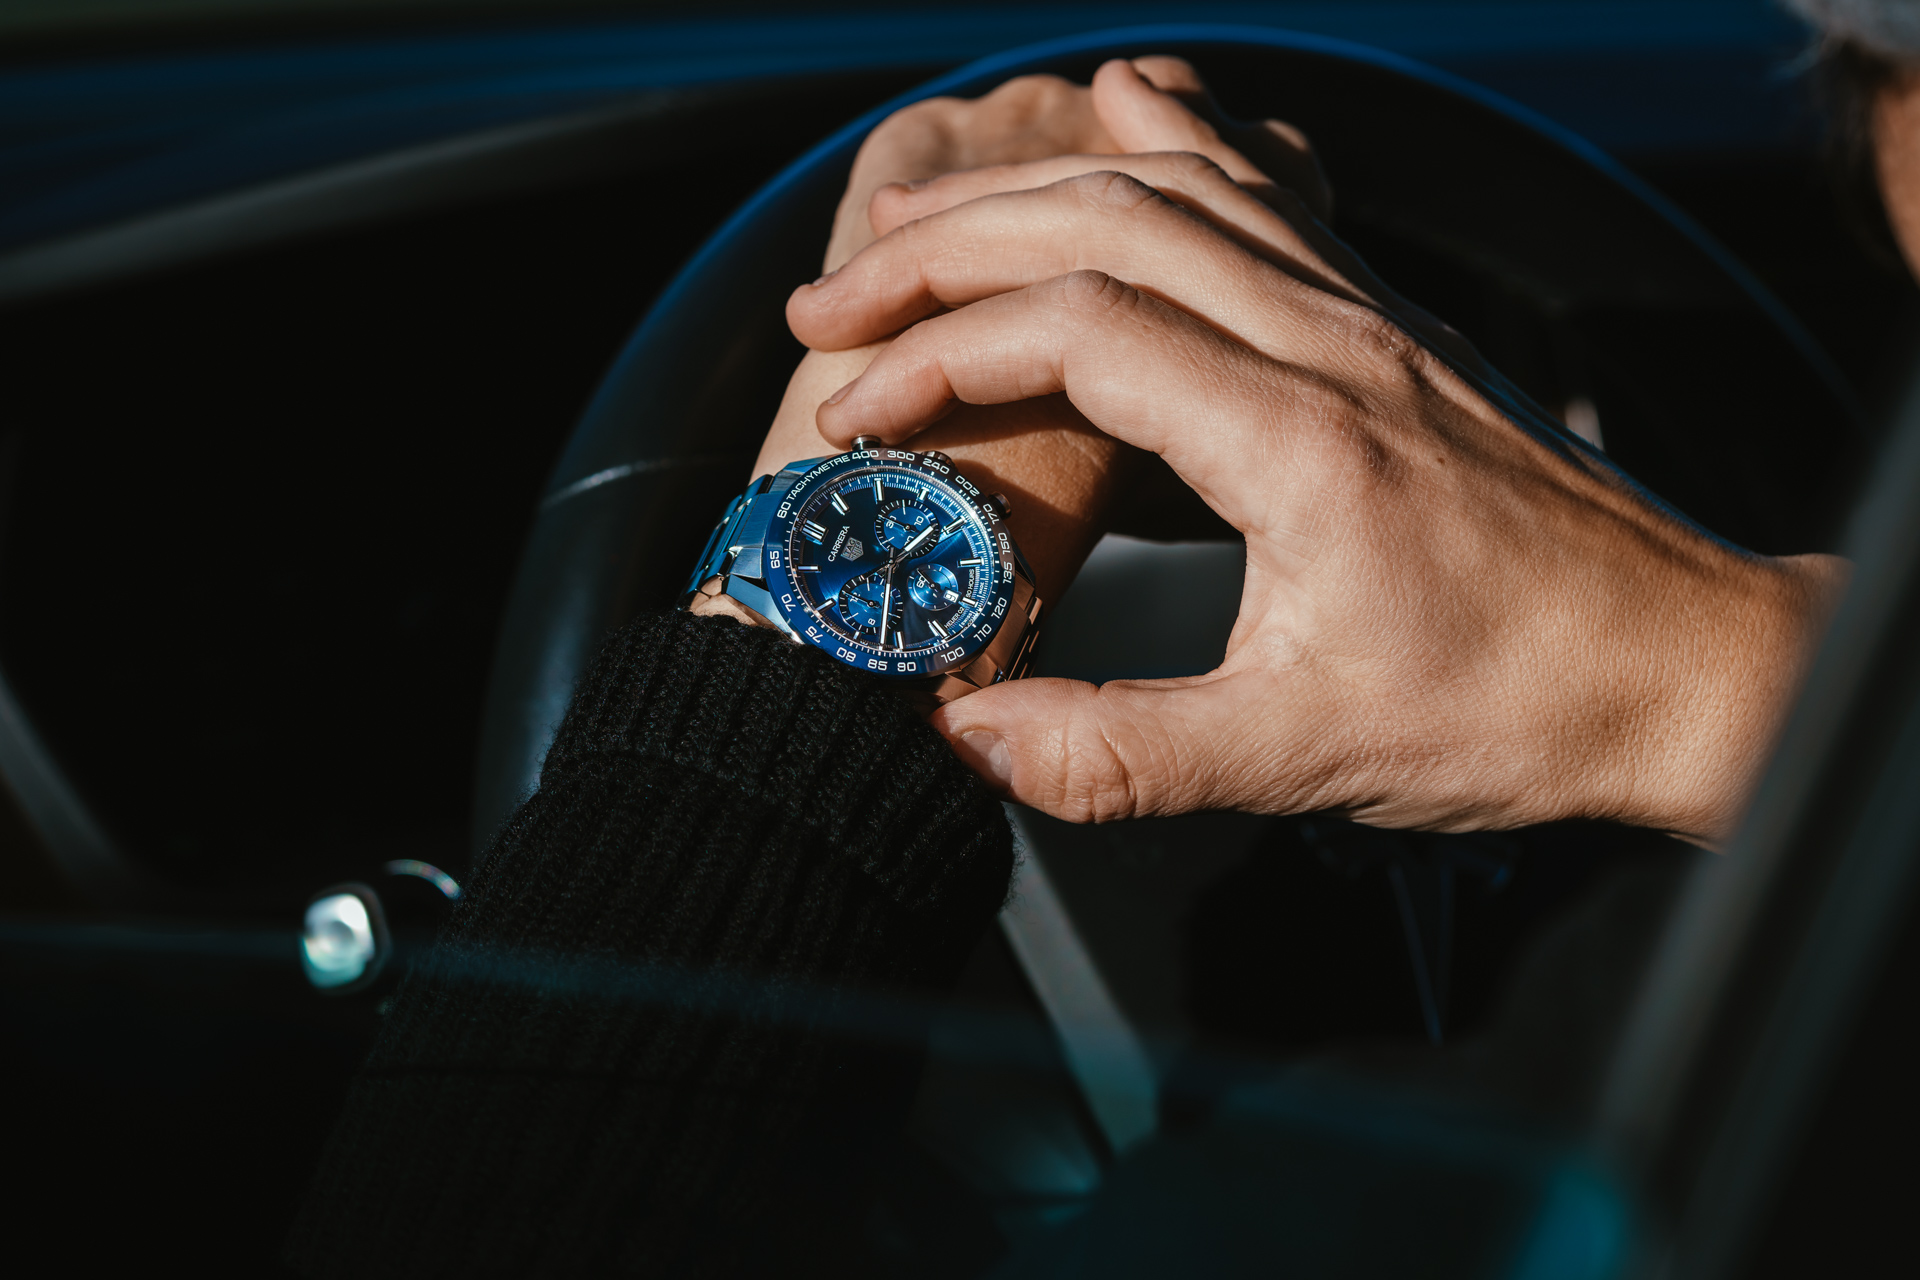 Luxury TAG Heuer Carrera Sport Replica Chronograph